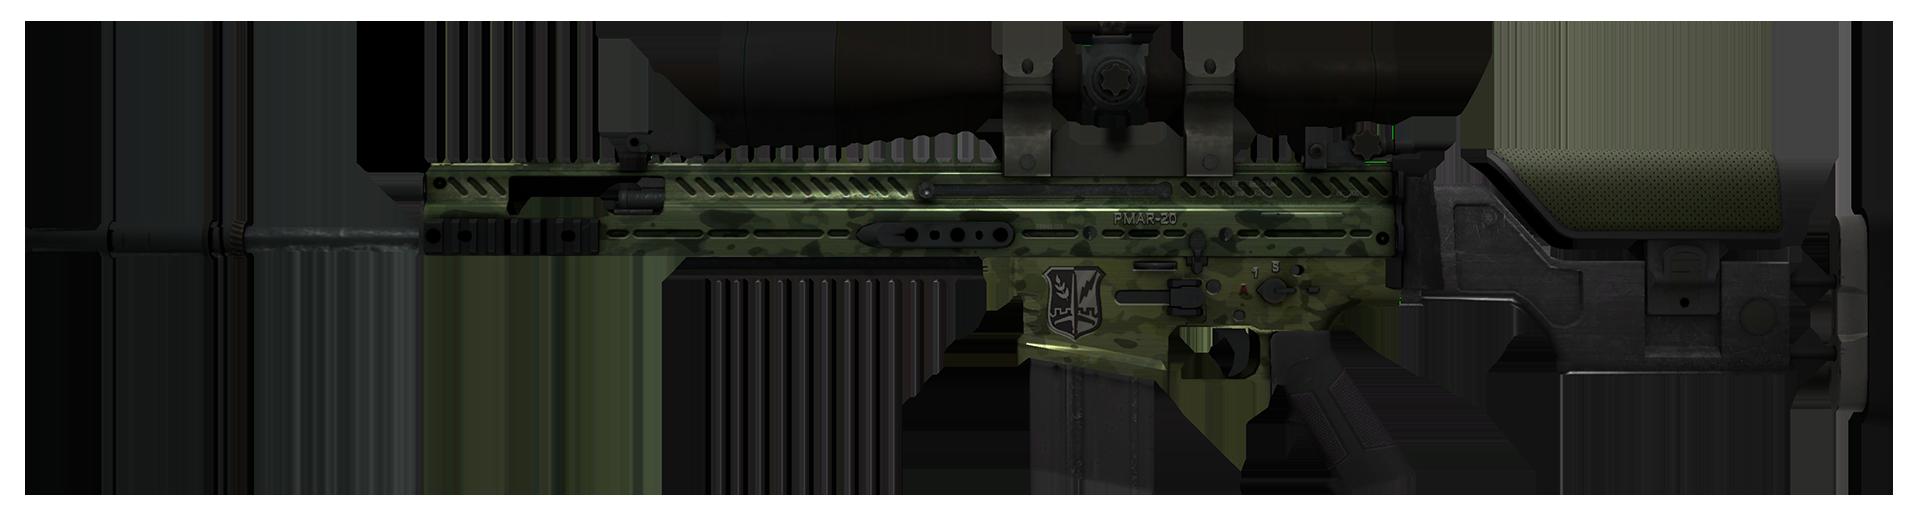 SCAR-20 Green Marine Large Rendering